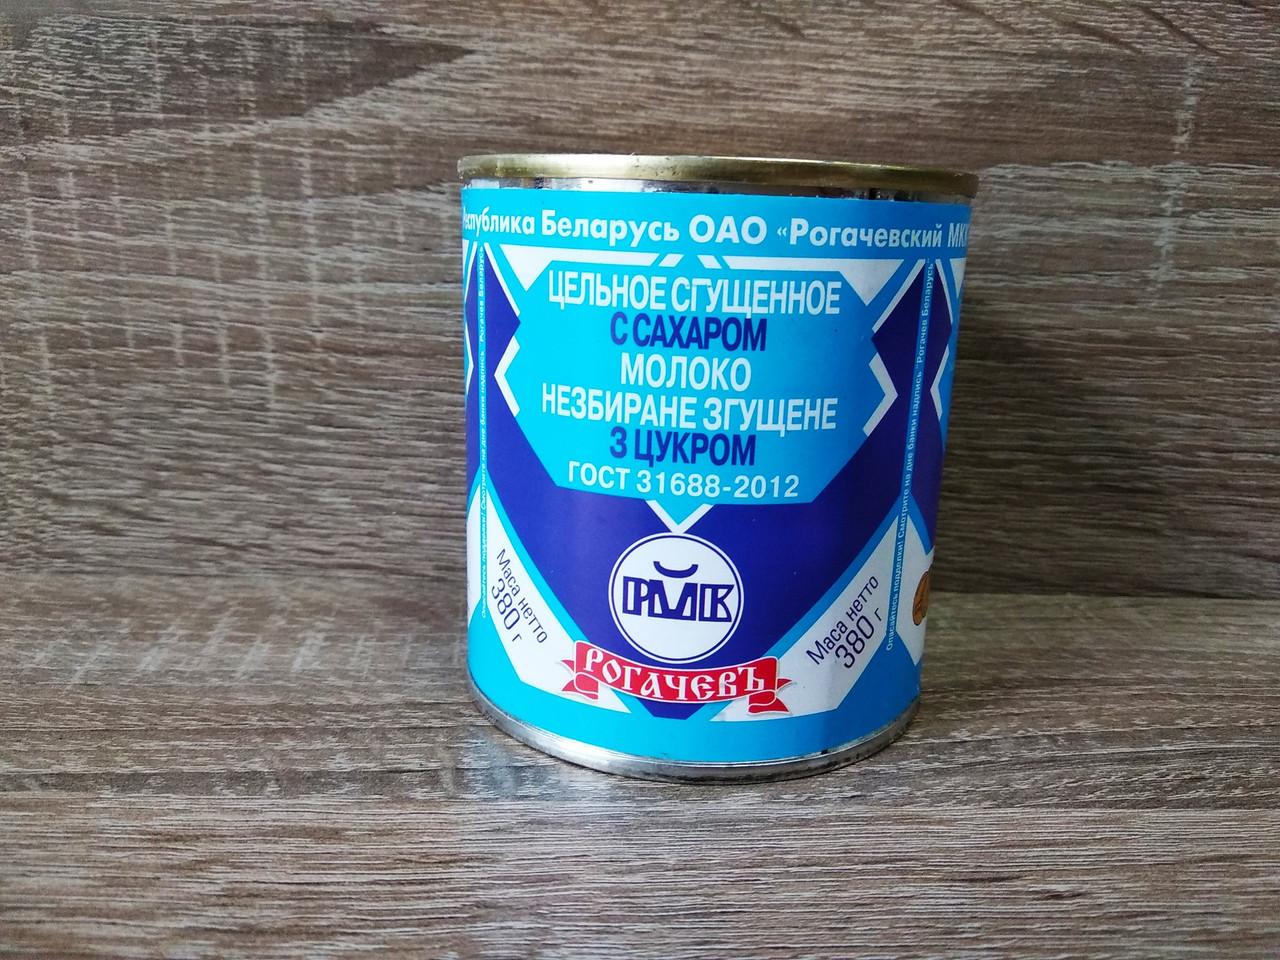 "Молоко сгущене ""РОГАЧЕВ"", 380 гр."